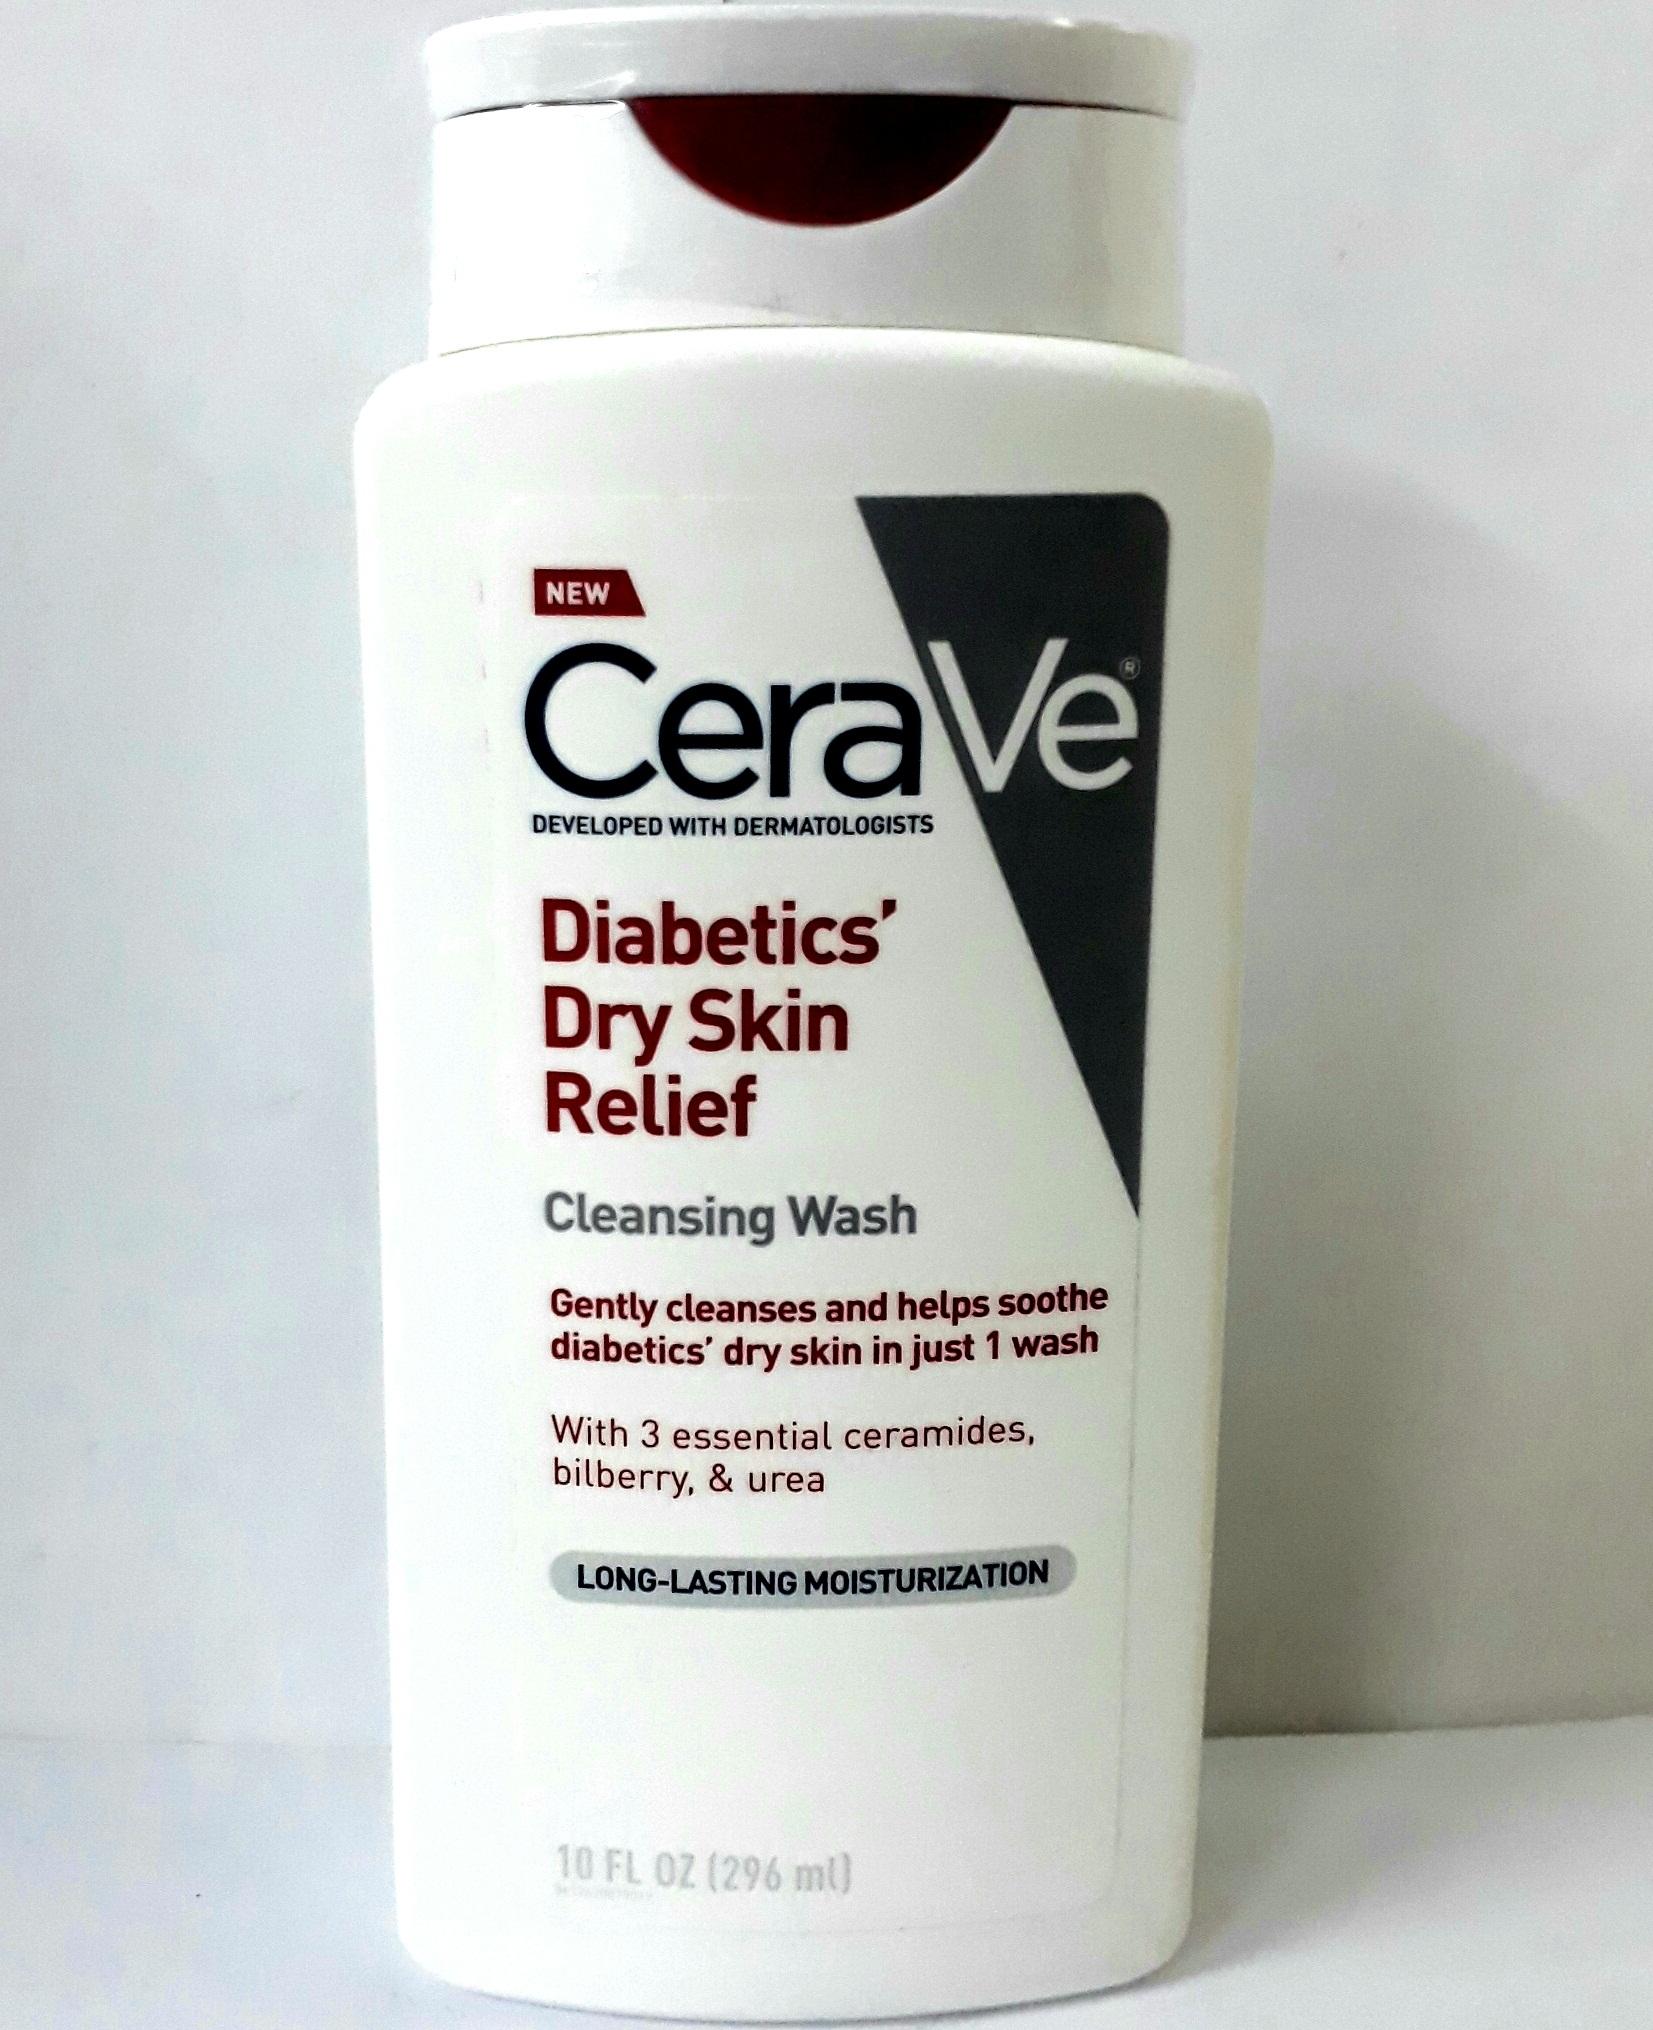 Cerave Diabetics Dry Skin Relief Cleansing Wash 10fl Oz 296 Ml